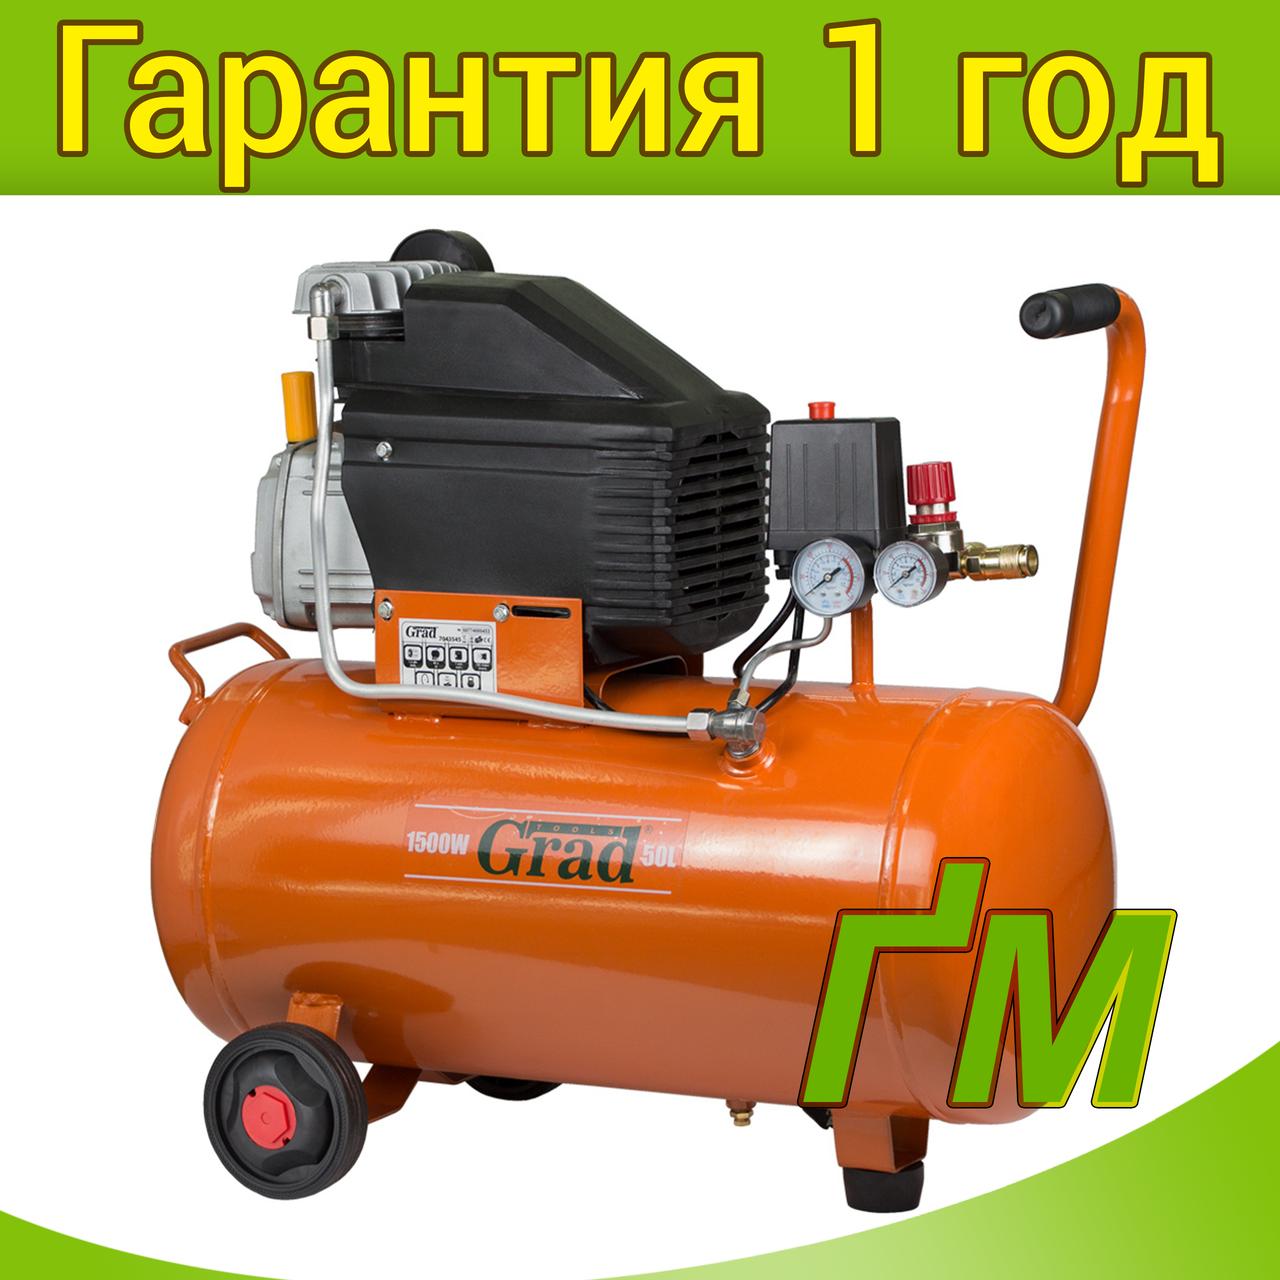 Компрессор одноцилиндровый 1.5 кВт, 198 л/мин, 8 бар, 50 л GRAD (2 крана)